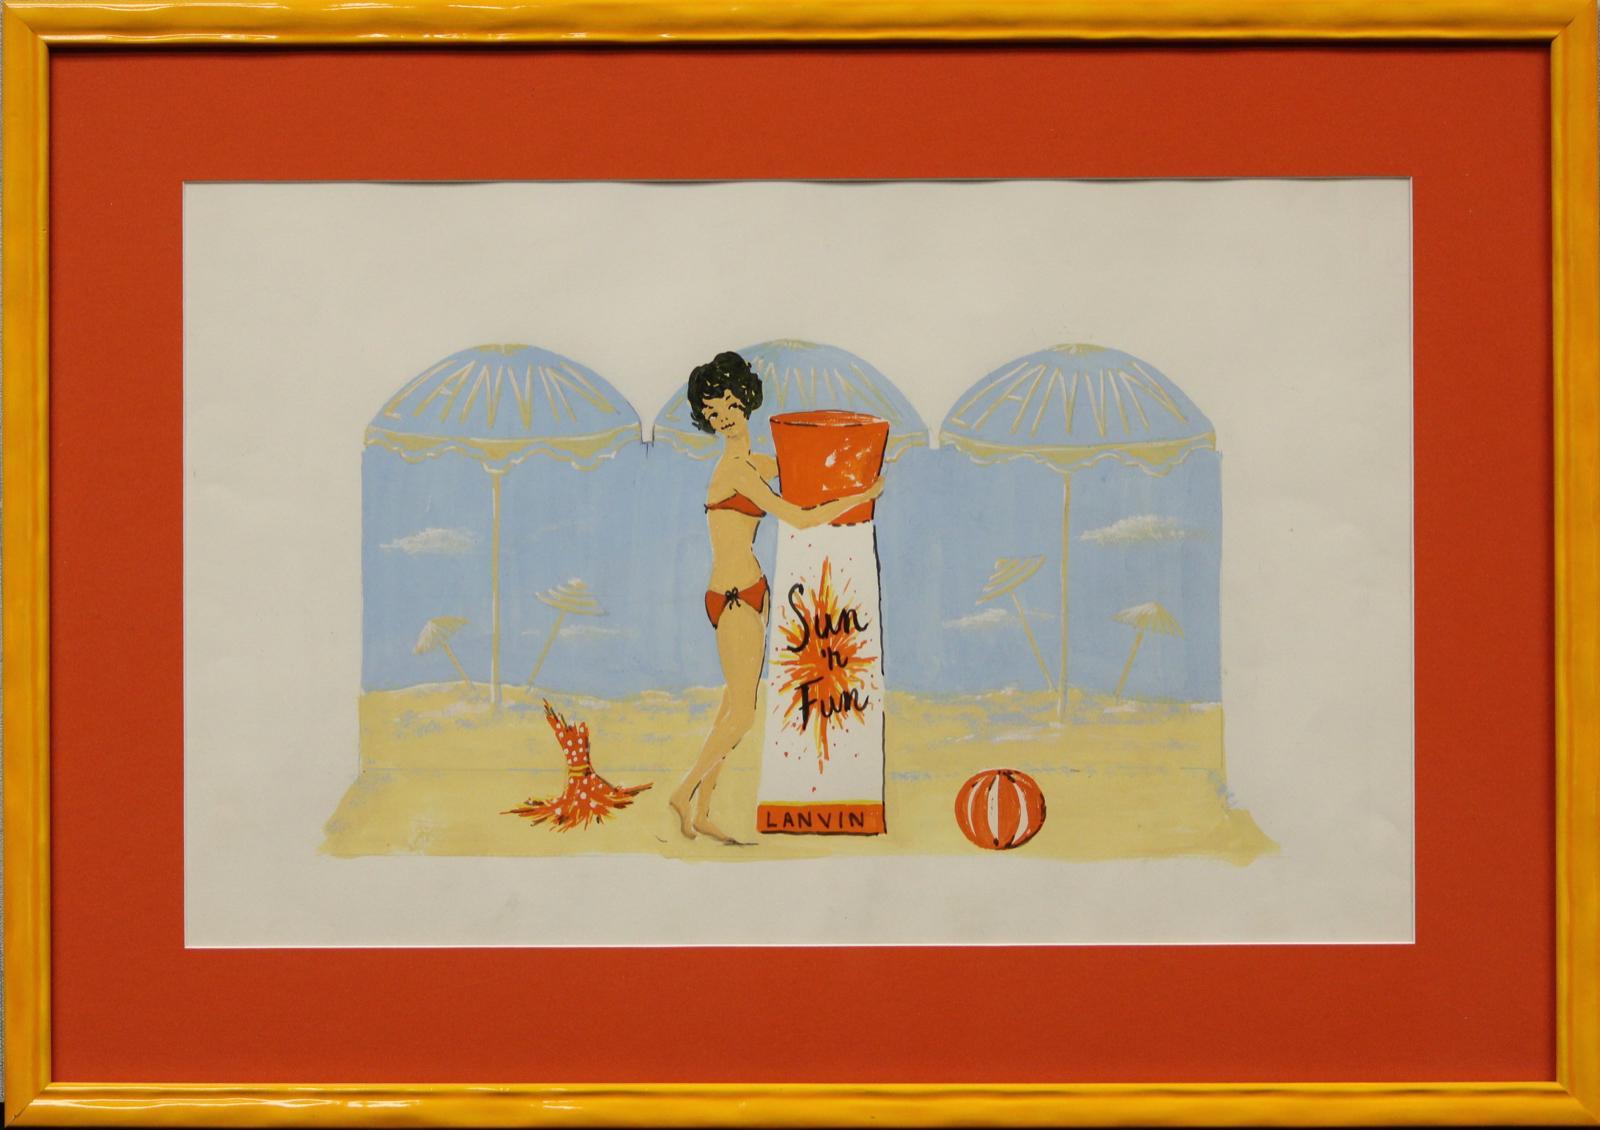 "Original Lanvin Paris Advert Artwork ""Fun 'n Sun"" by Alexander Warren Montel"